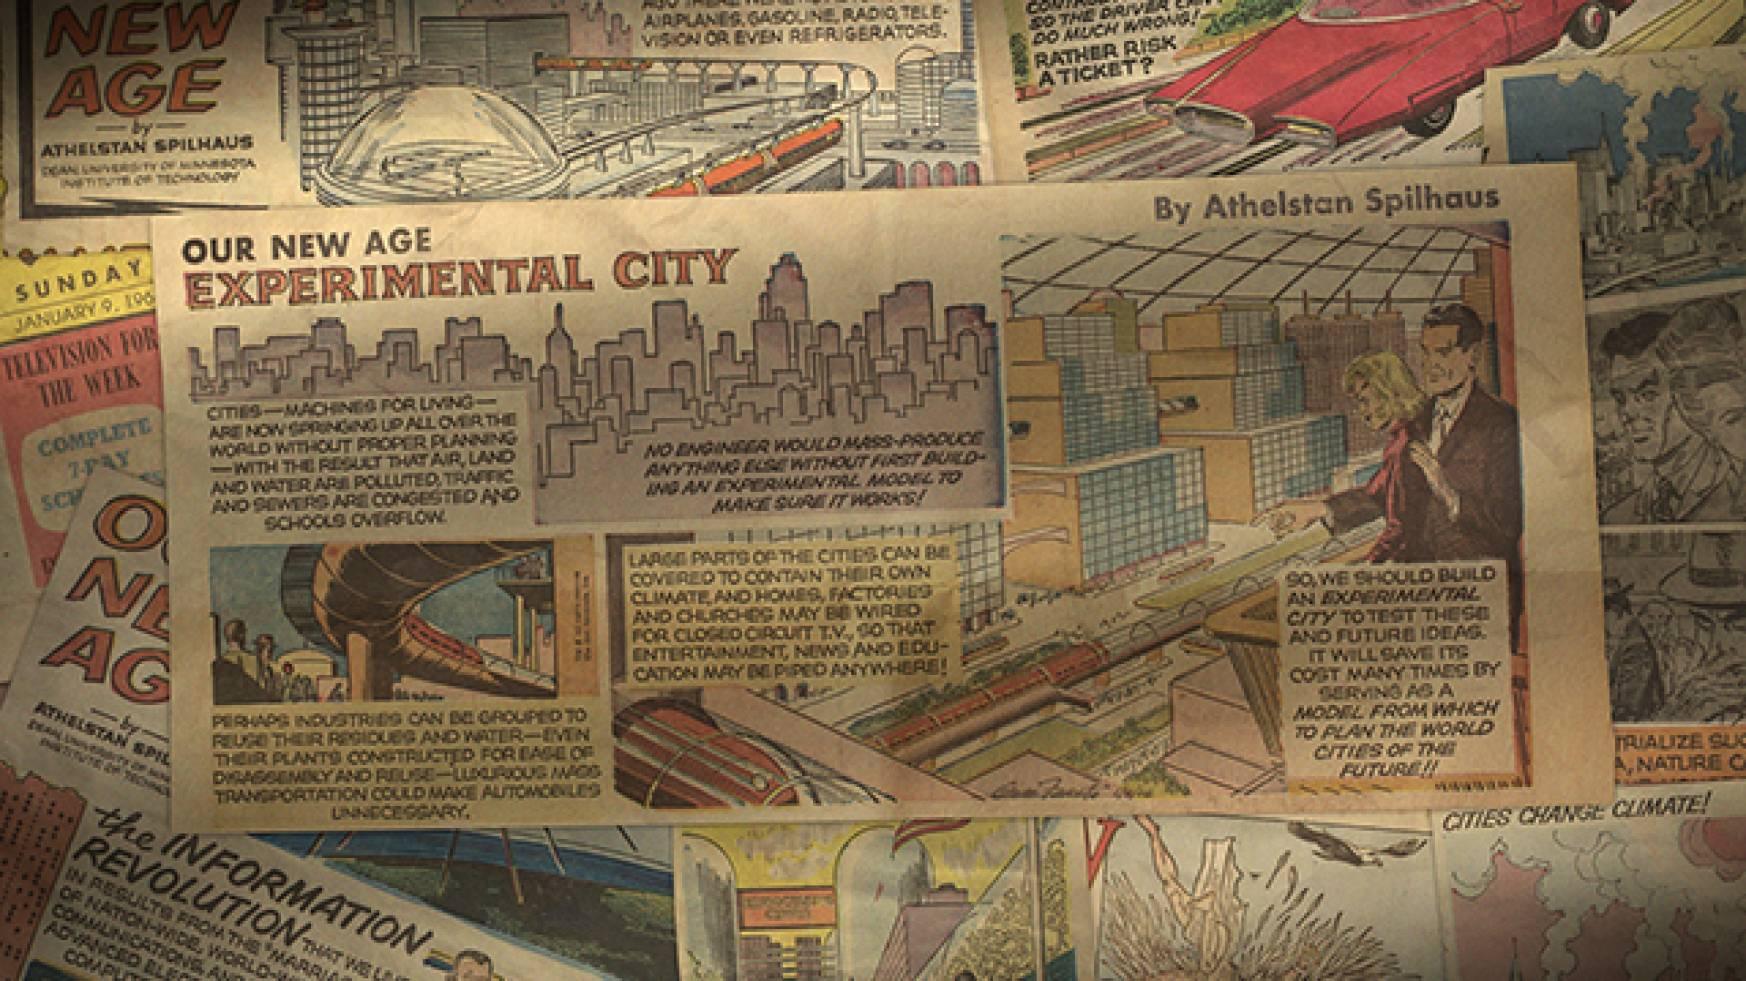 The-Experimental-City_primaryStill_01-1746x981-c-center.jpg